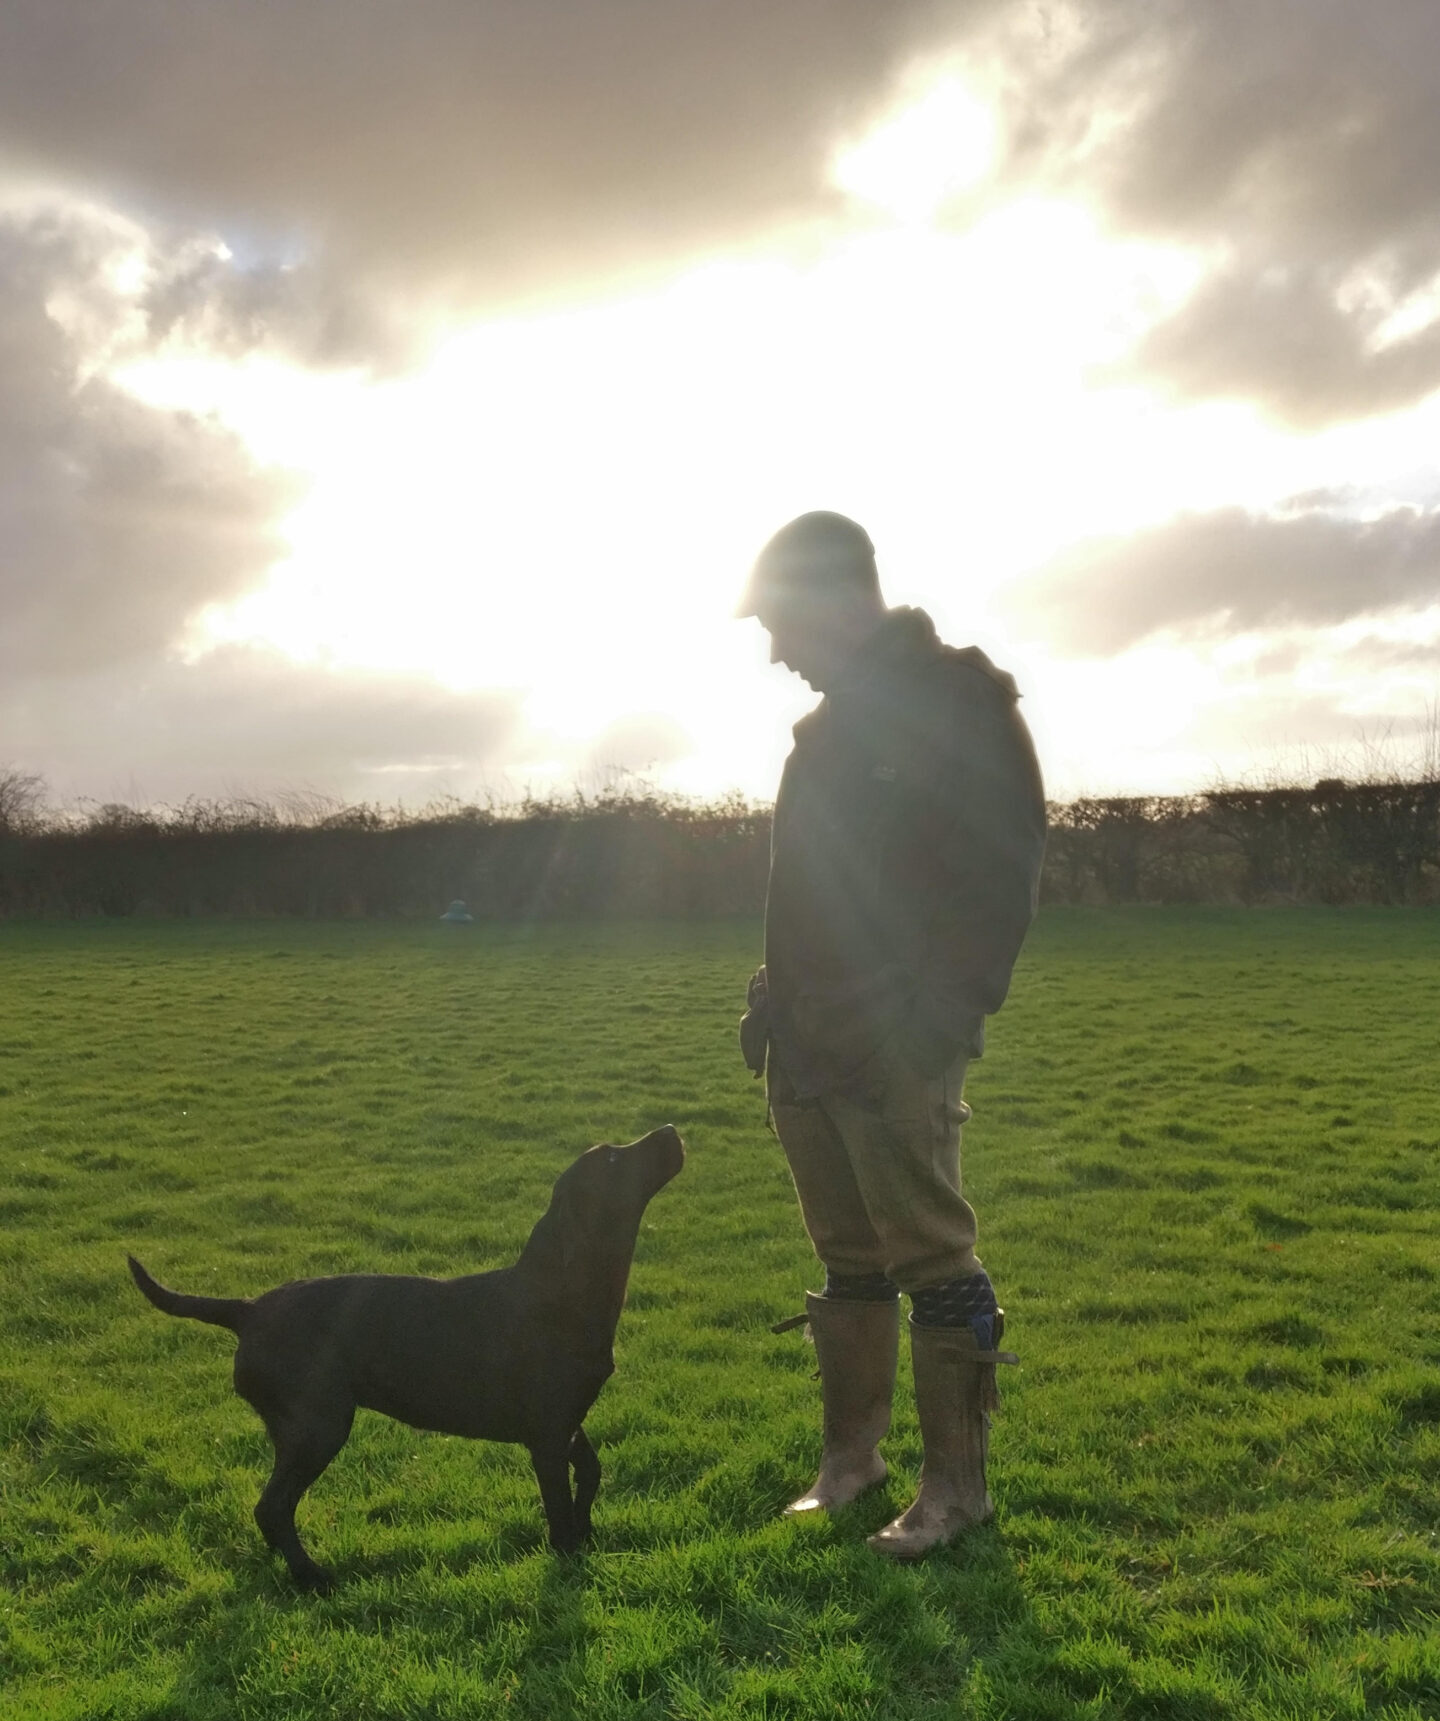 man with dog shotgun and firearms applications and renewals medical reports - Shotgun Medicals